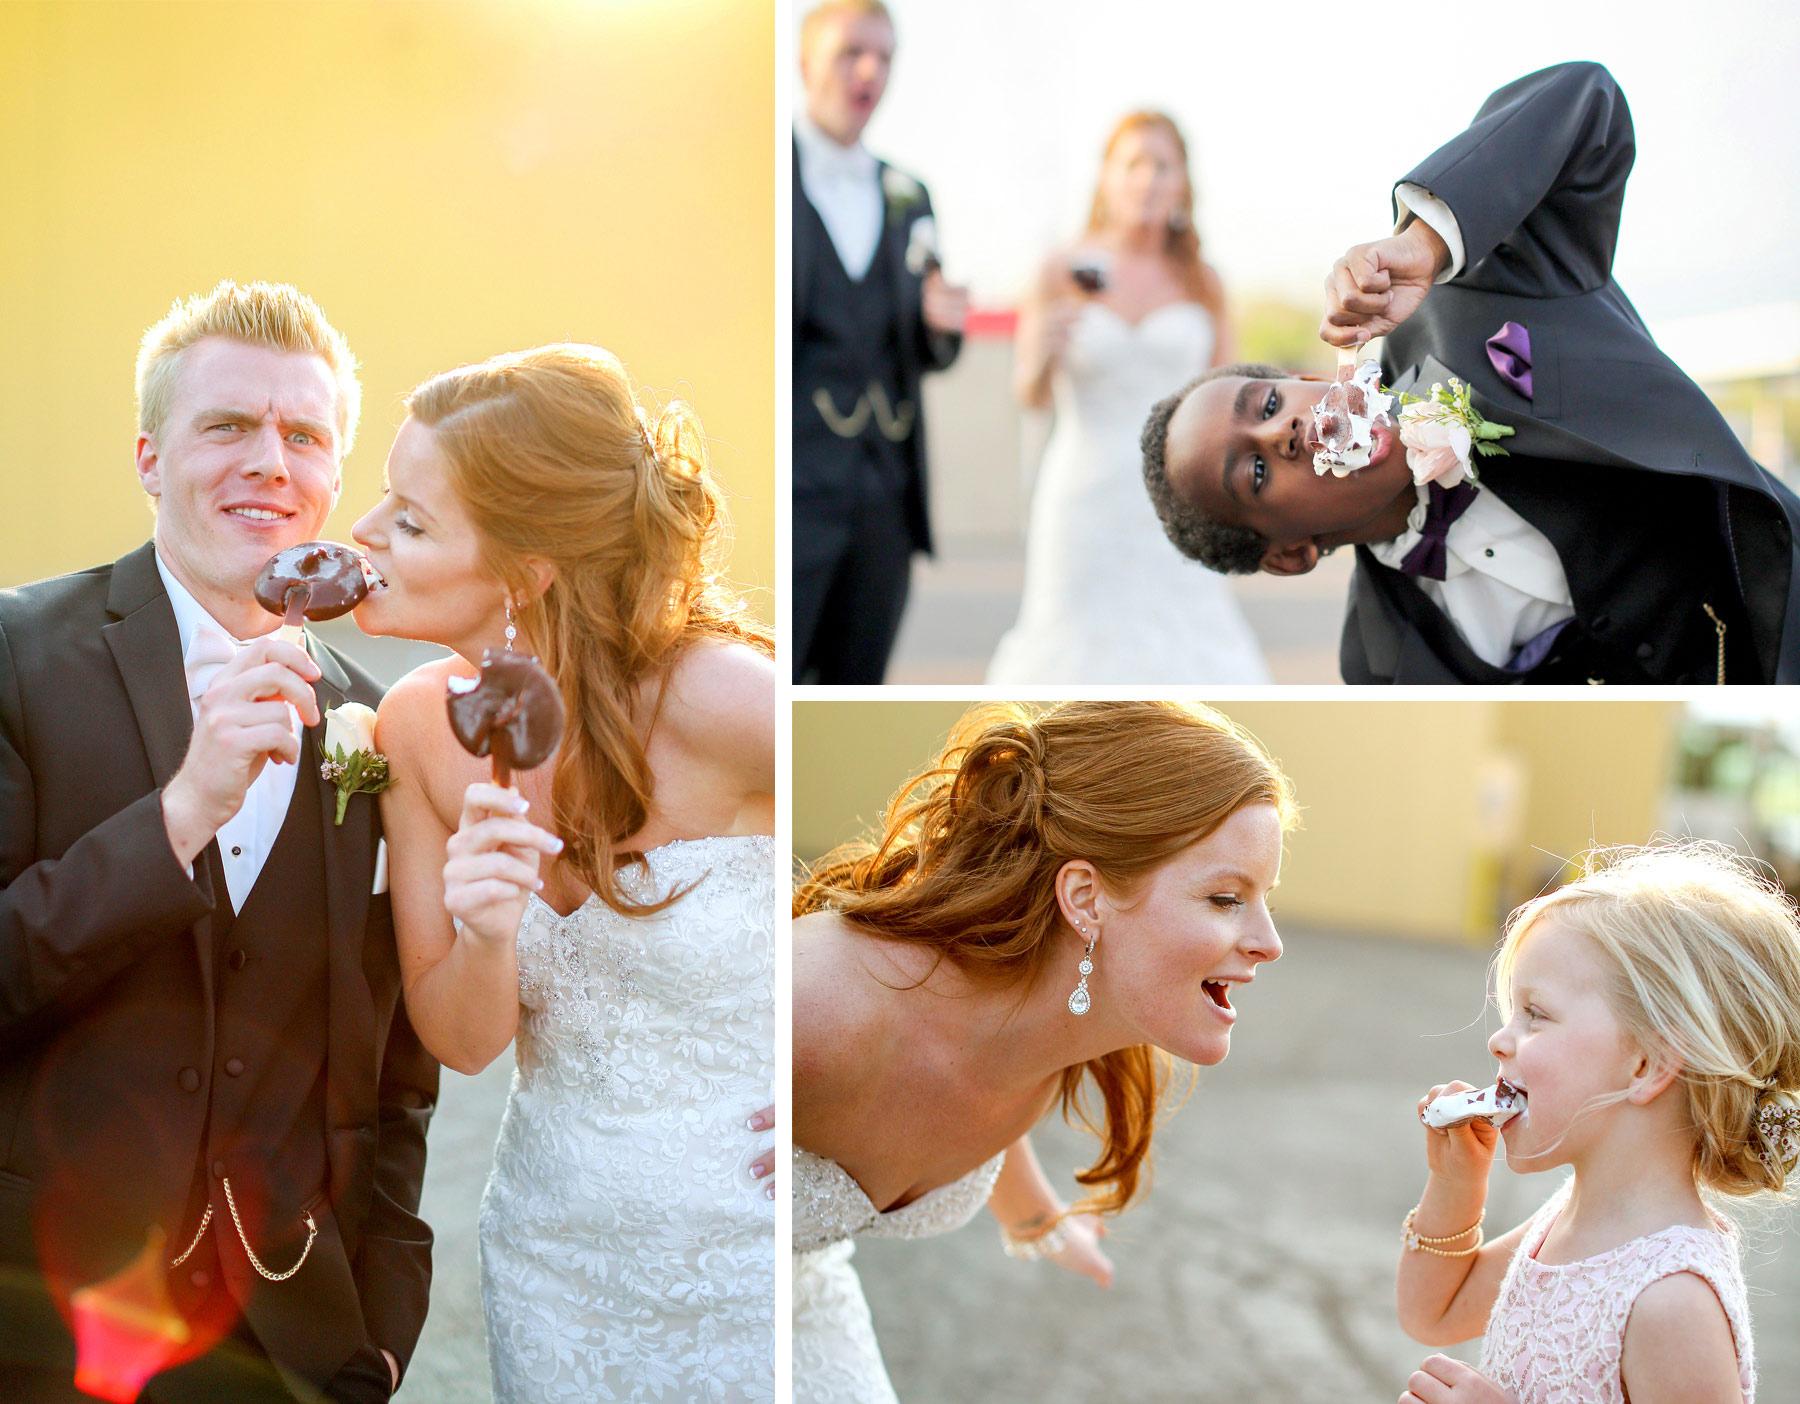 12-Minneapolis-Minnesota-Wedding-Photography-by-Vick-Photography-Dairy-Queen-Wedding-Dilly-Bar-Tianna-&-Matt.jpg